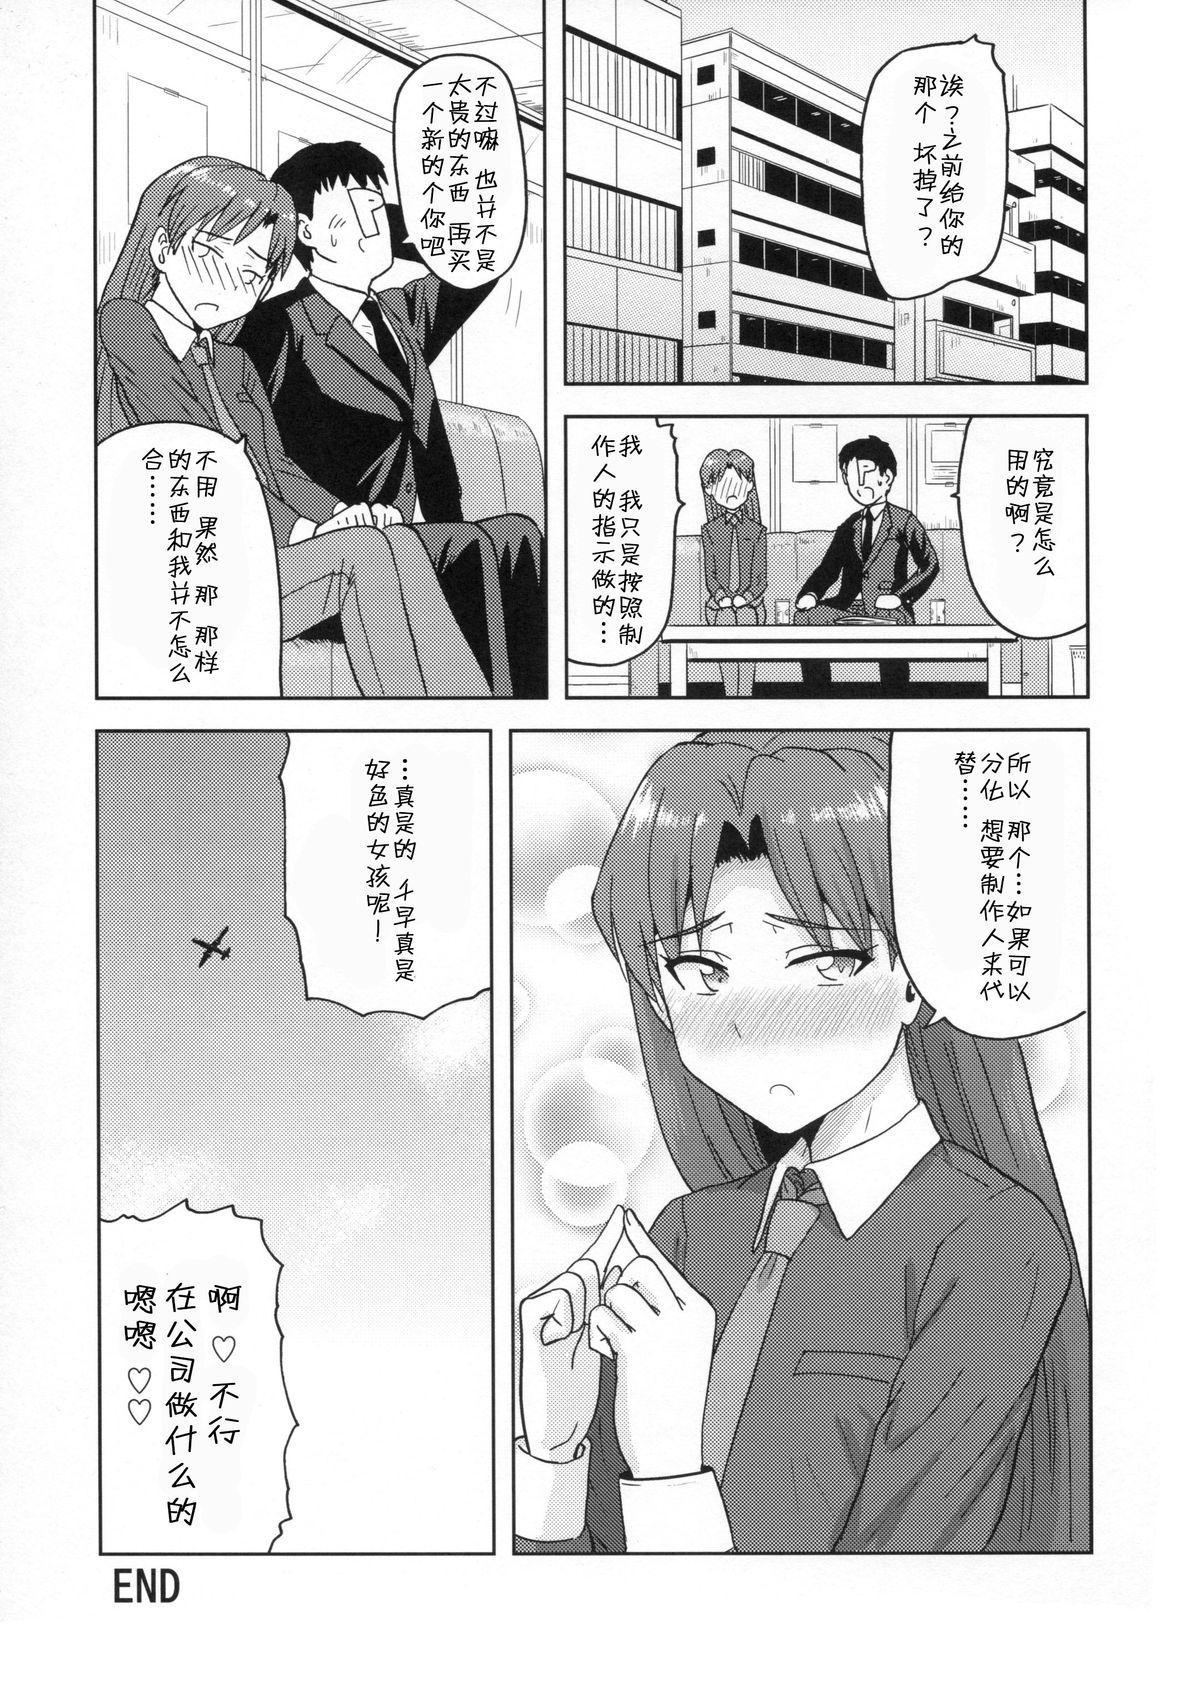 Kisaragi Chihaya no Tanjou Kinenbi 24